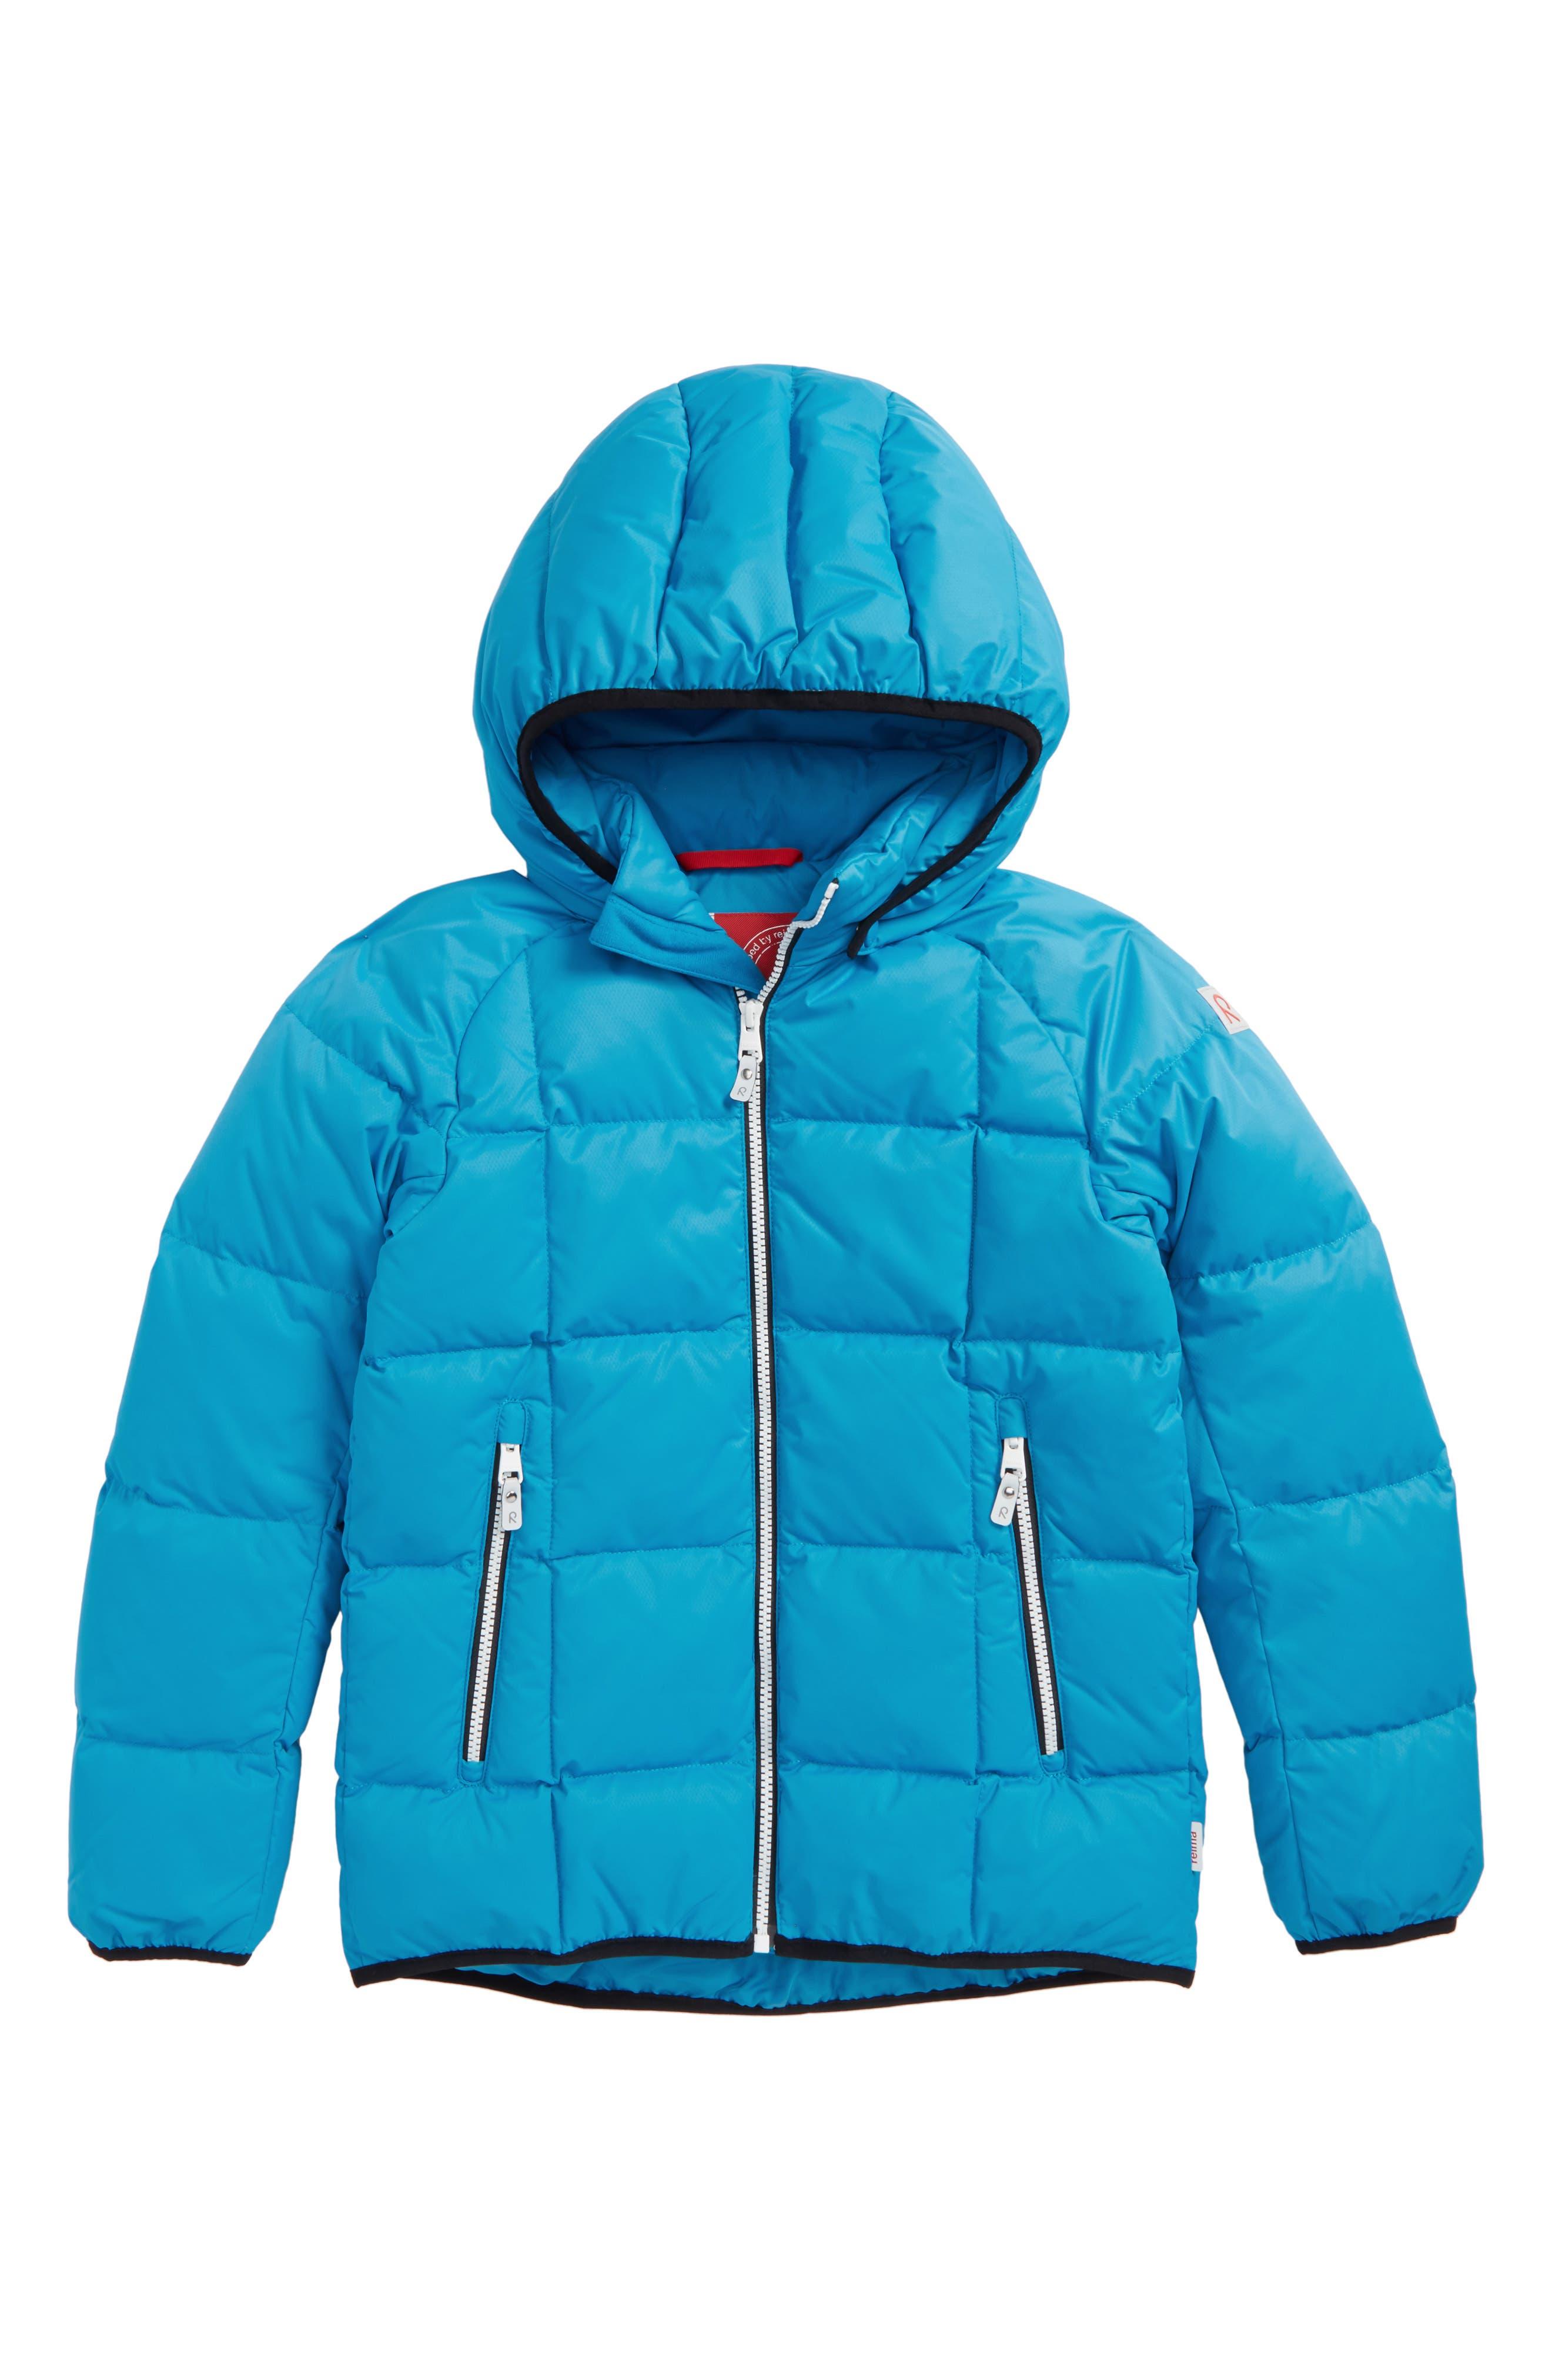 Jord Down Waterproof Insulated Coat,                             Main thumbnail 1, color,                             Blue